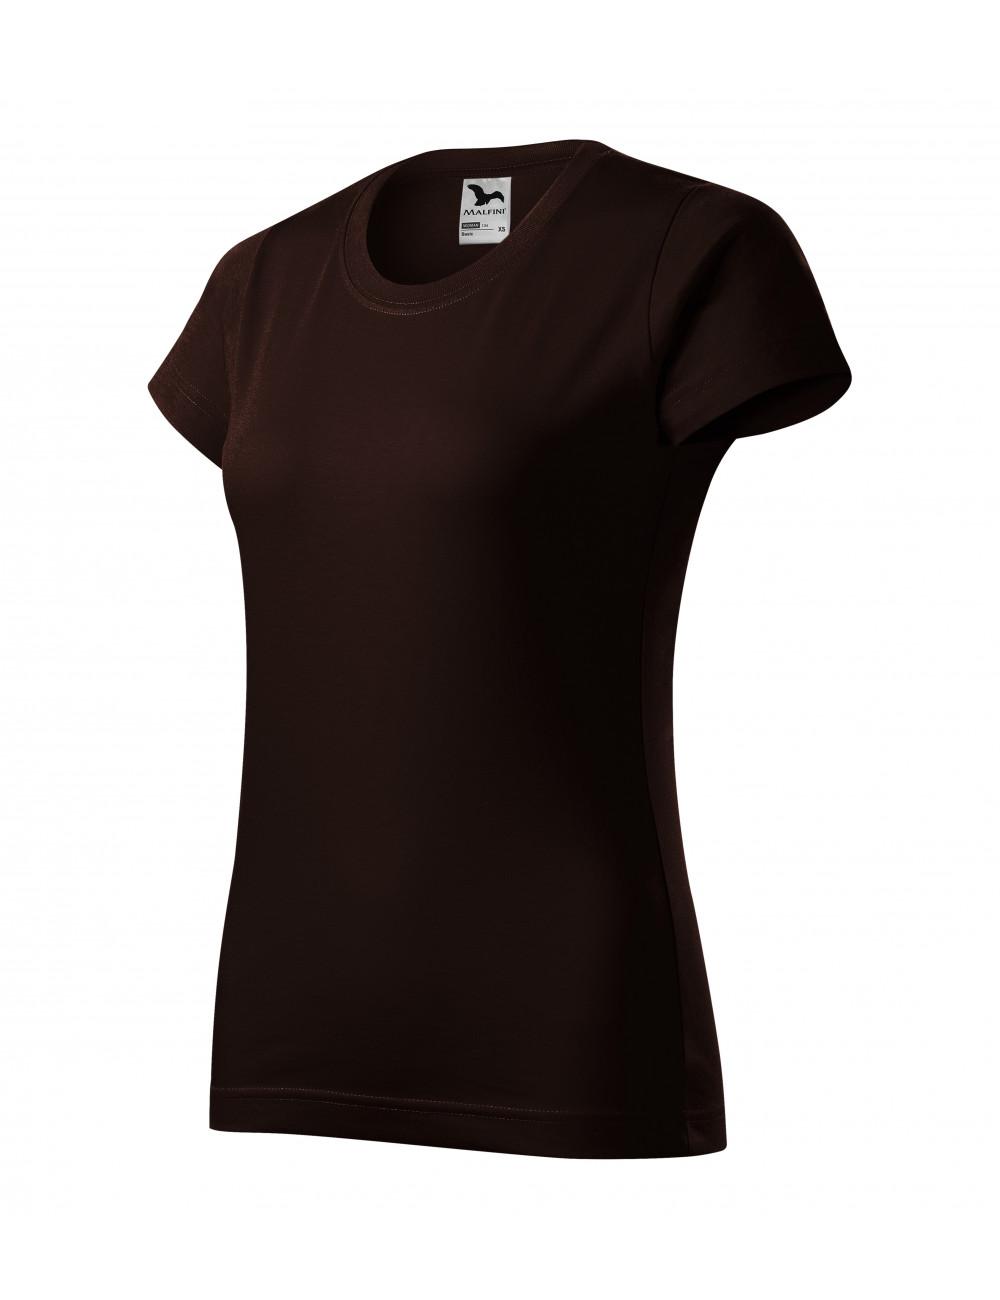 Adler MALFINI Koszulka damska Basic 134 kawowy